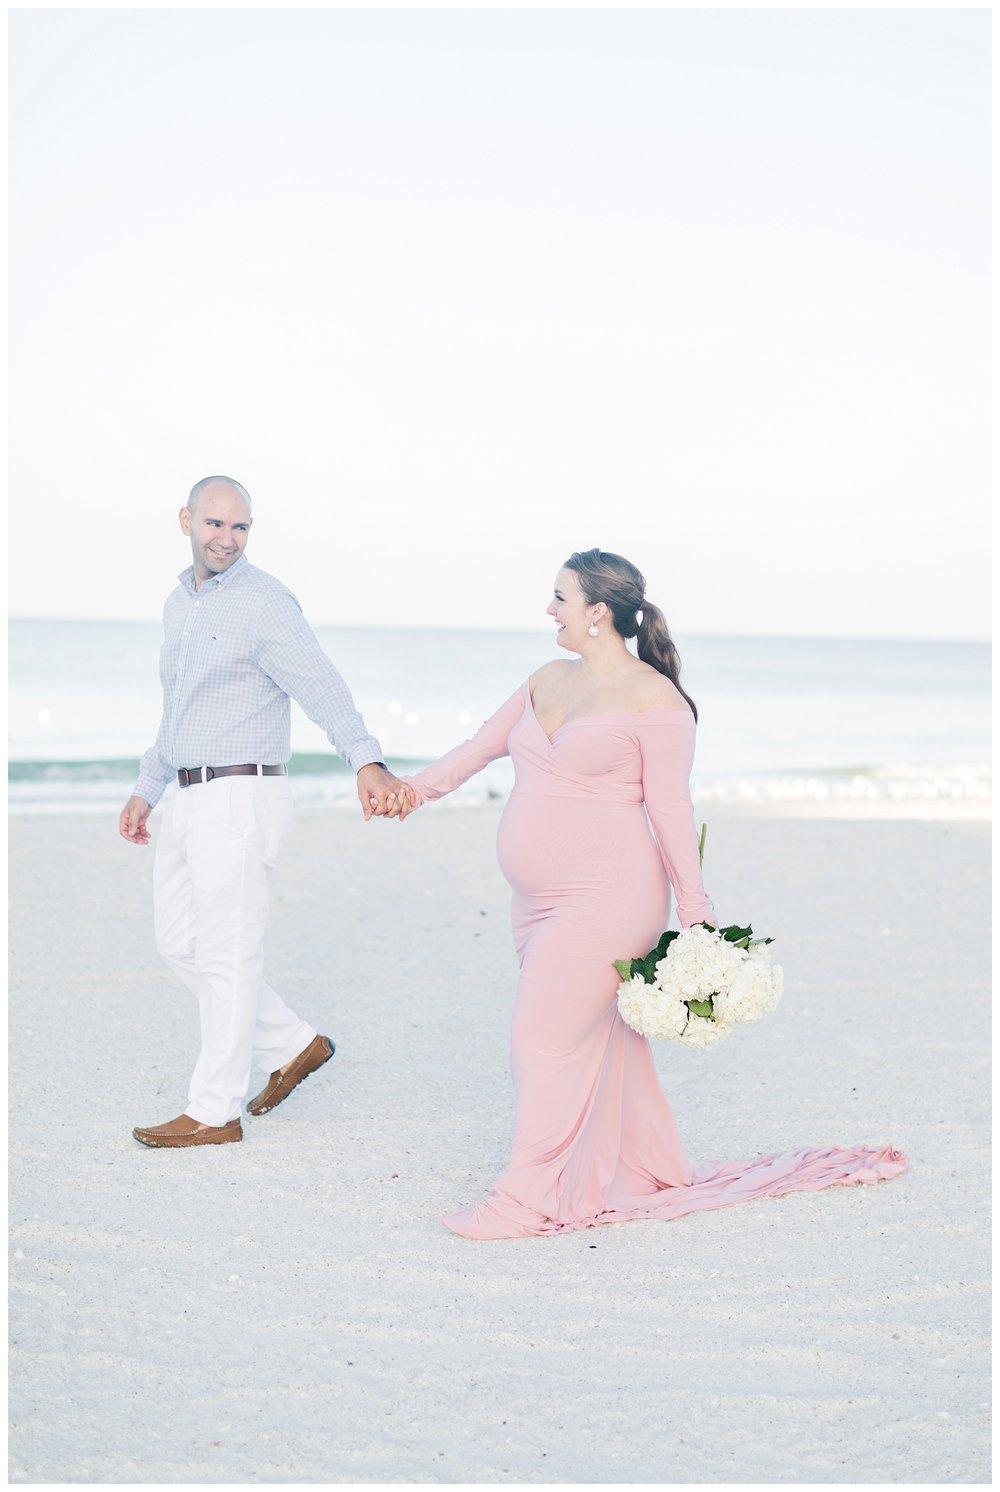 South Florida Maternity Session_0015.jpg